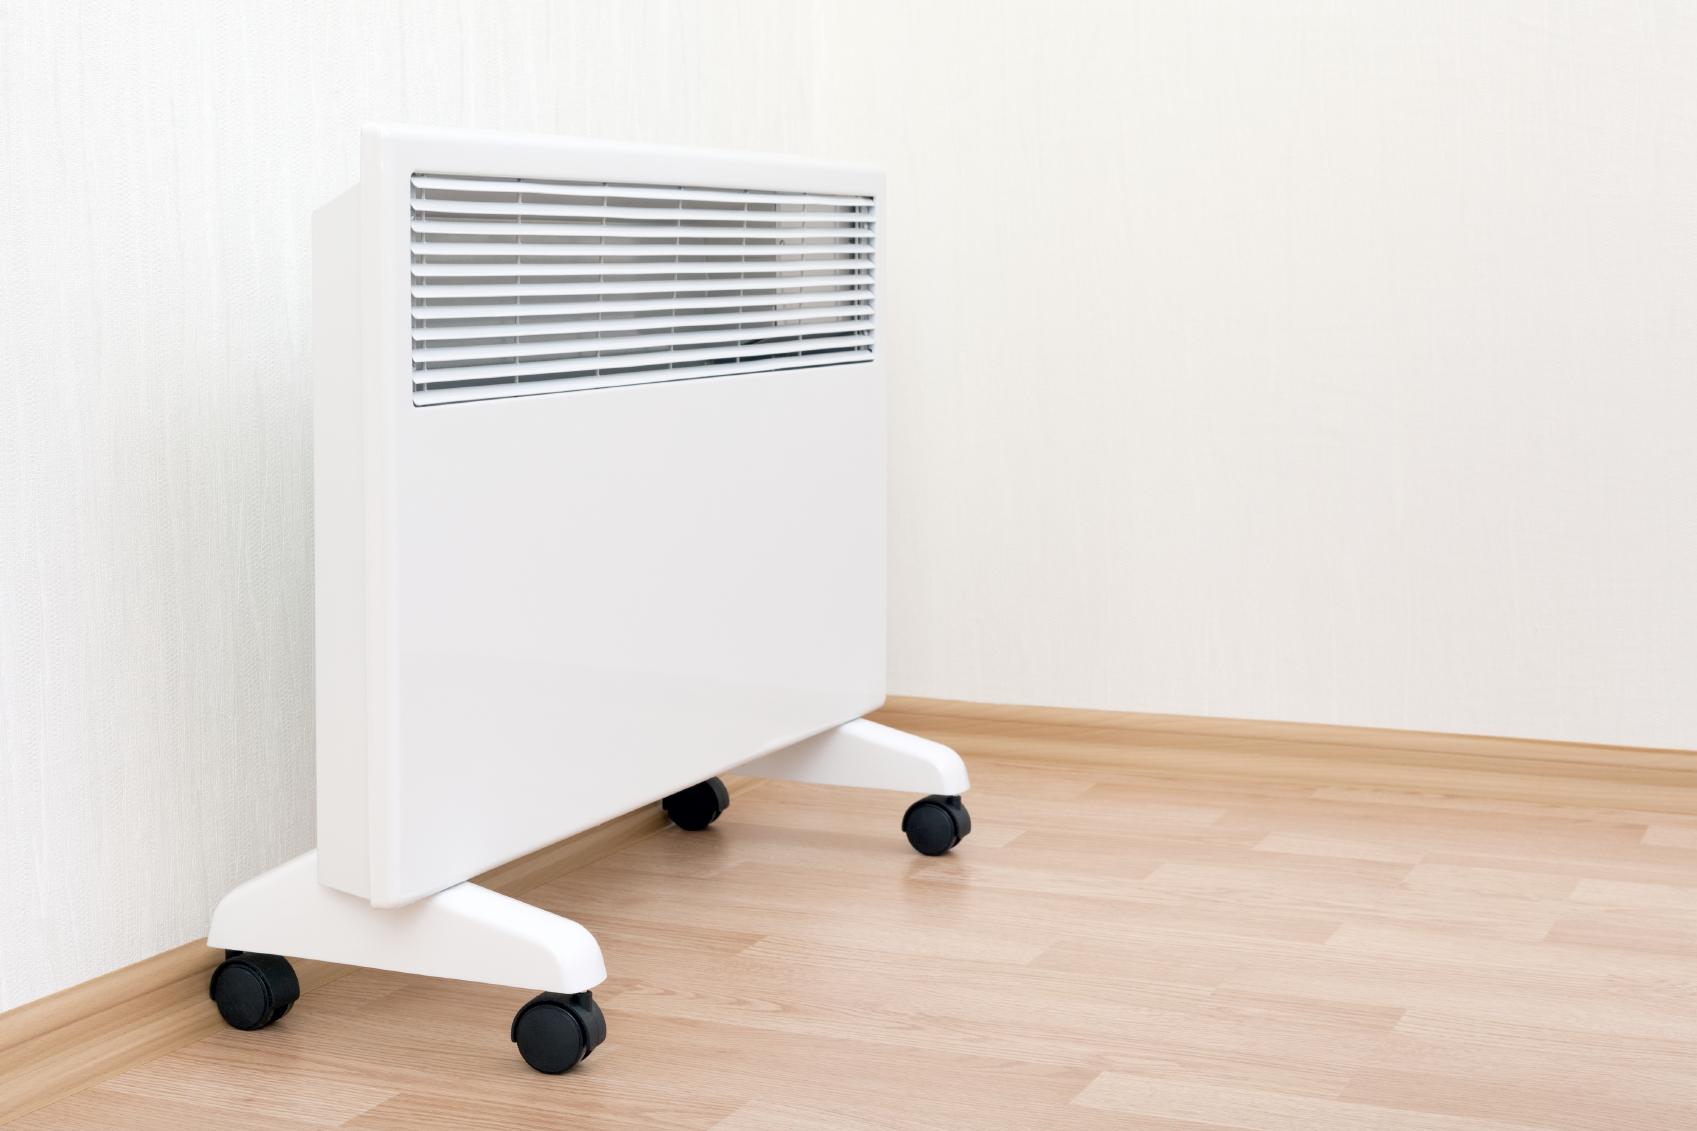 elektroheizung vor nachteile kosten 11880. Black Bedroom Furniture Sets. Home Design Ideas